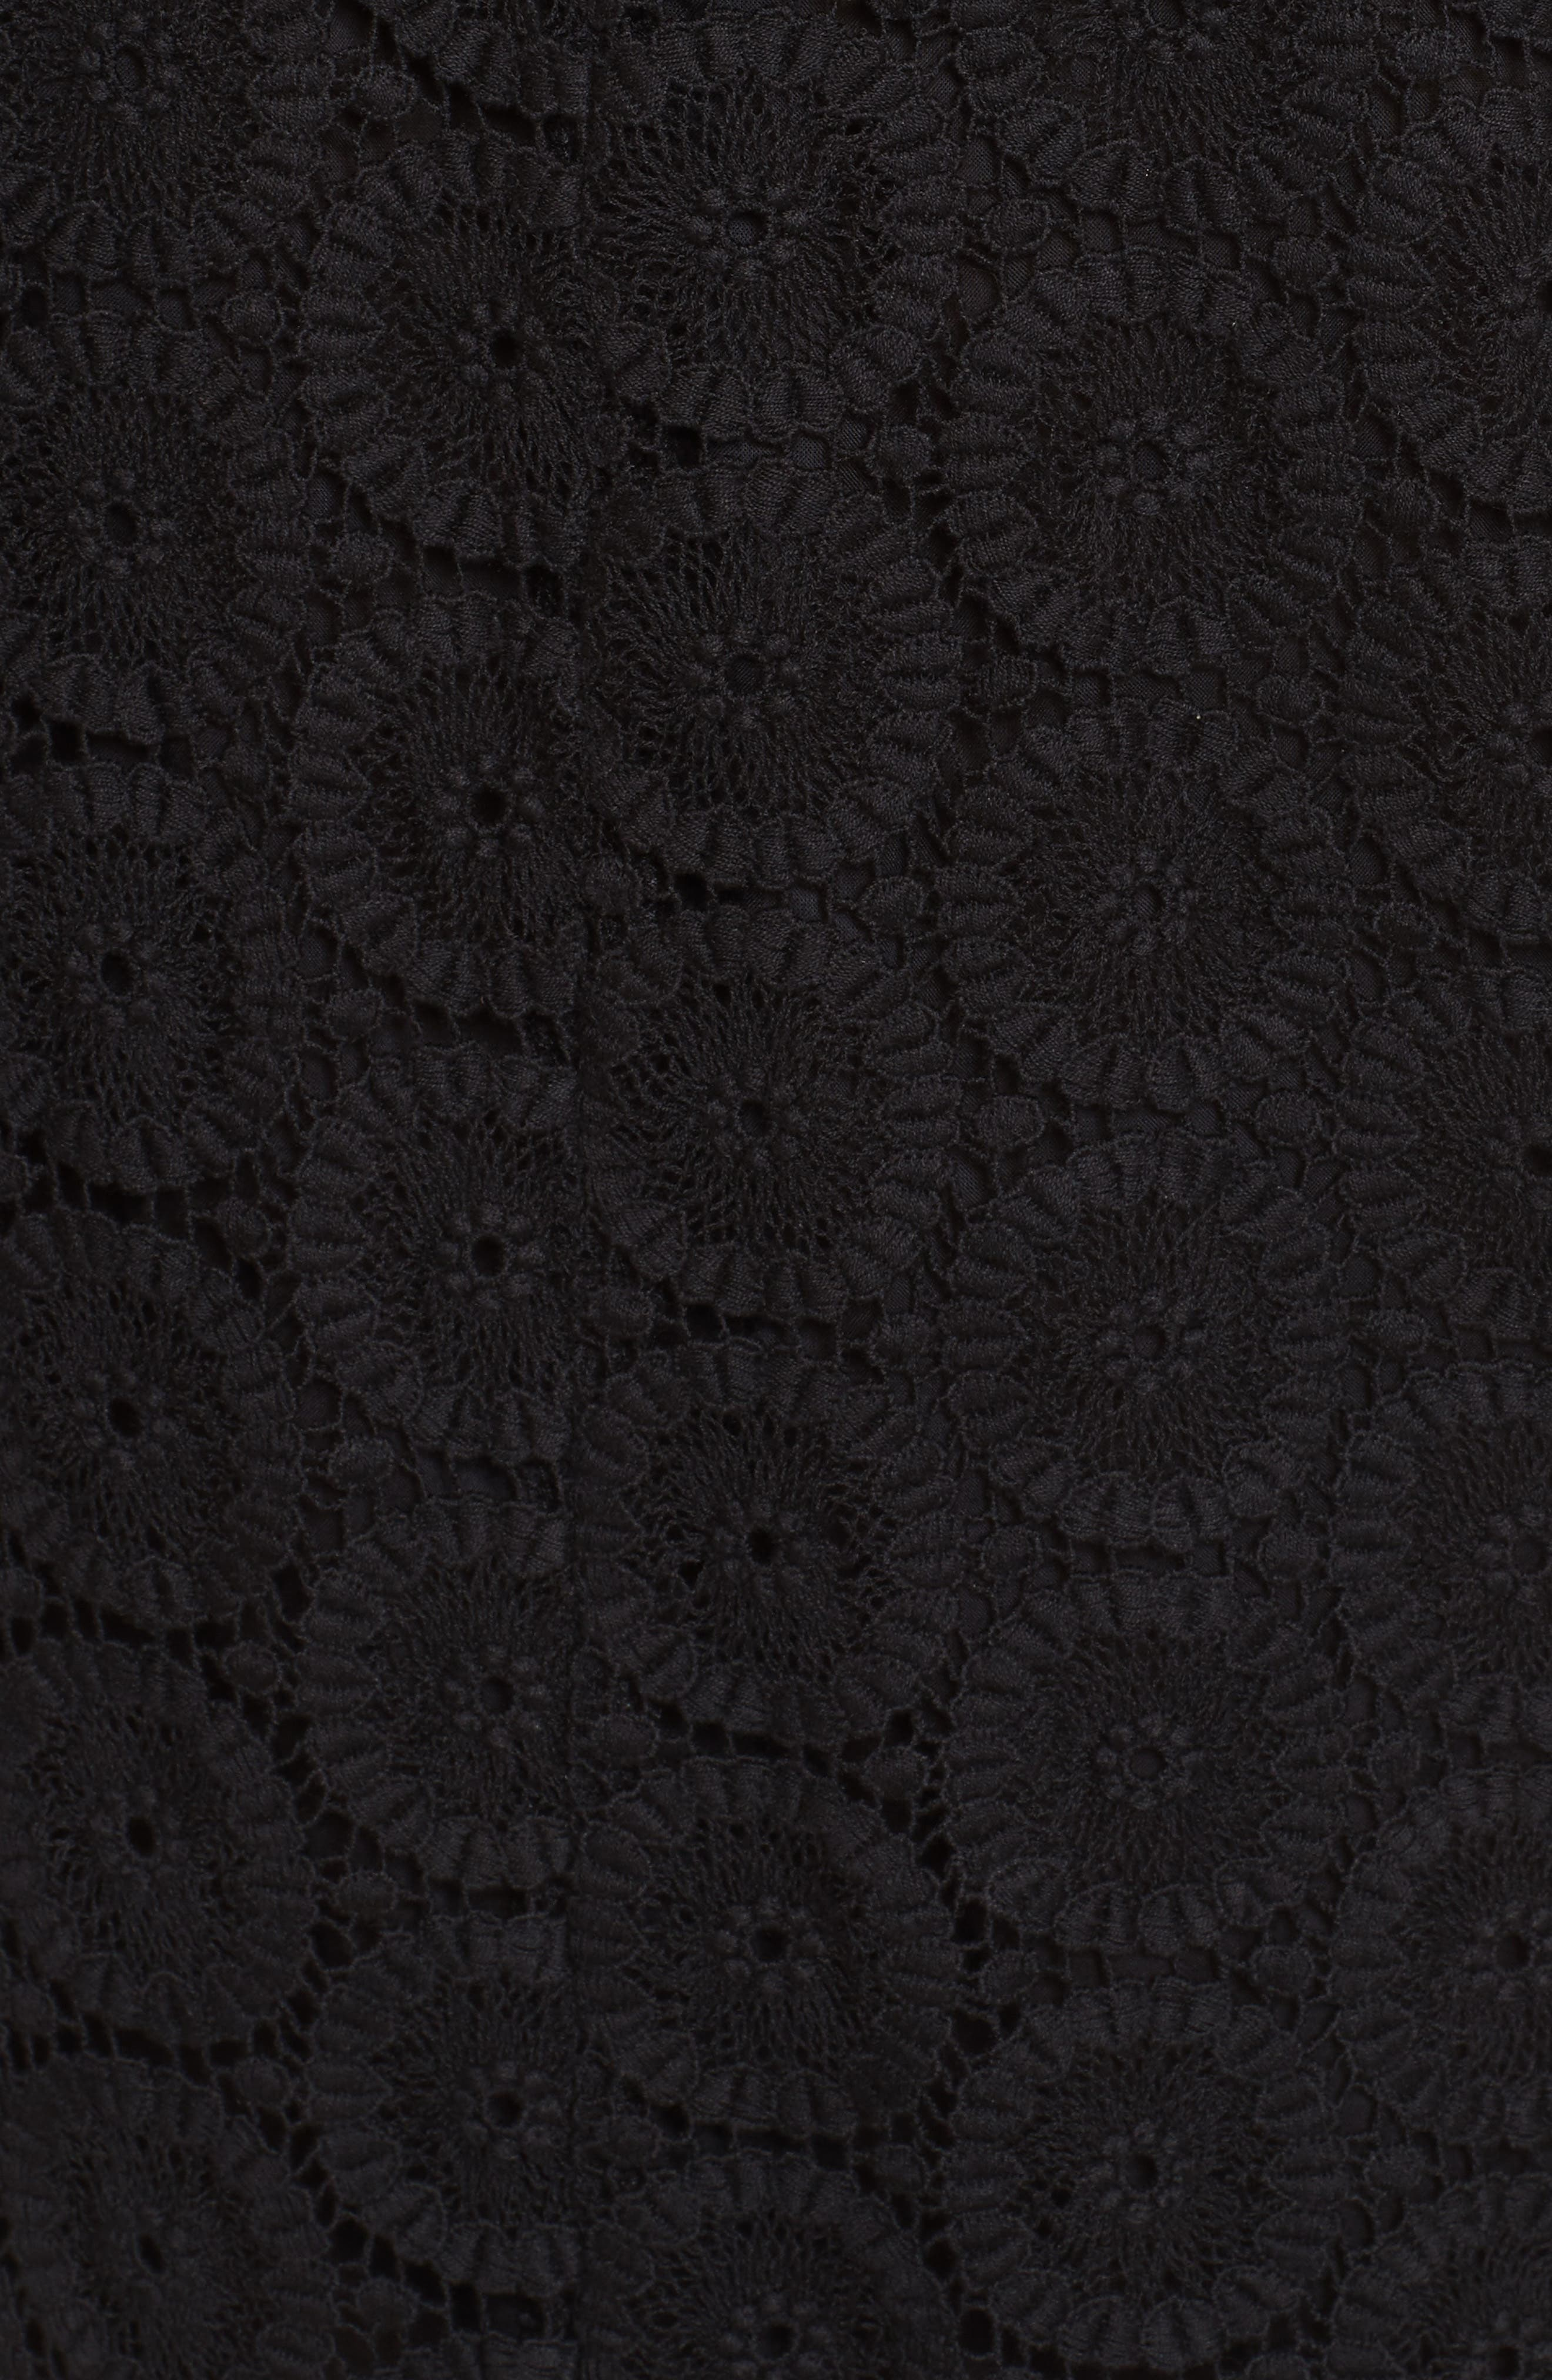 Cotton Crochet Shift Dress,                             Alternate thumbnail 5, color,                             001